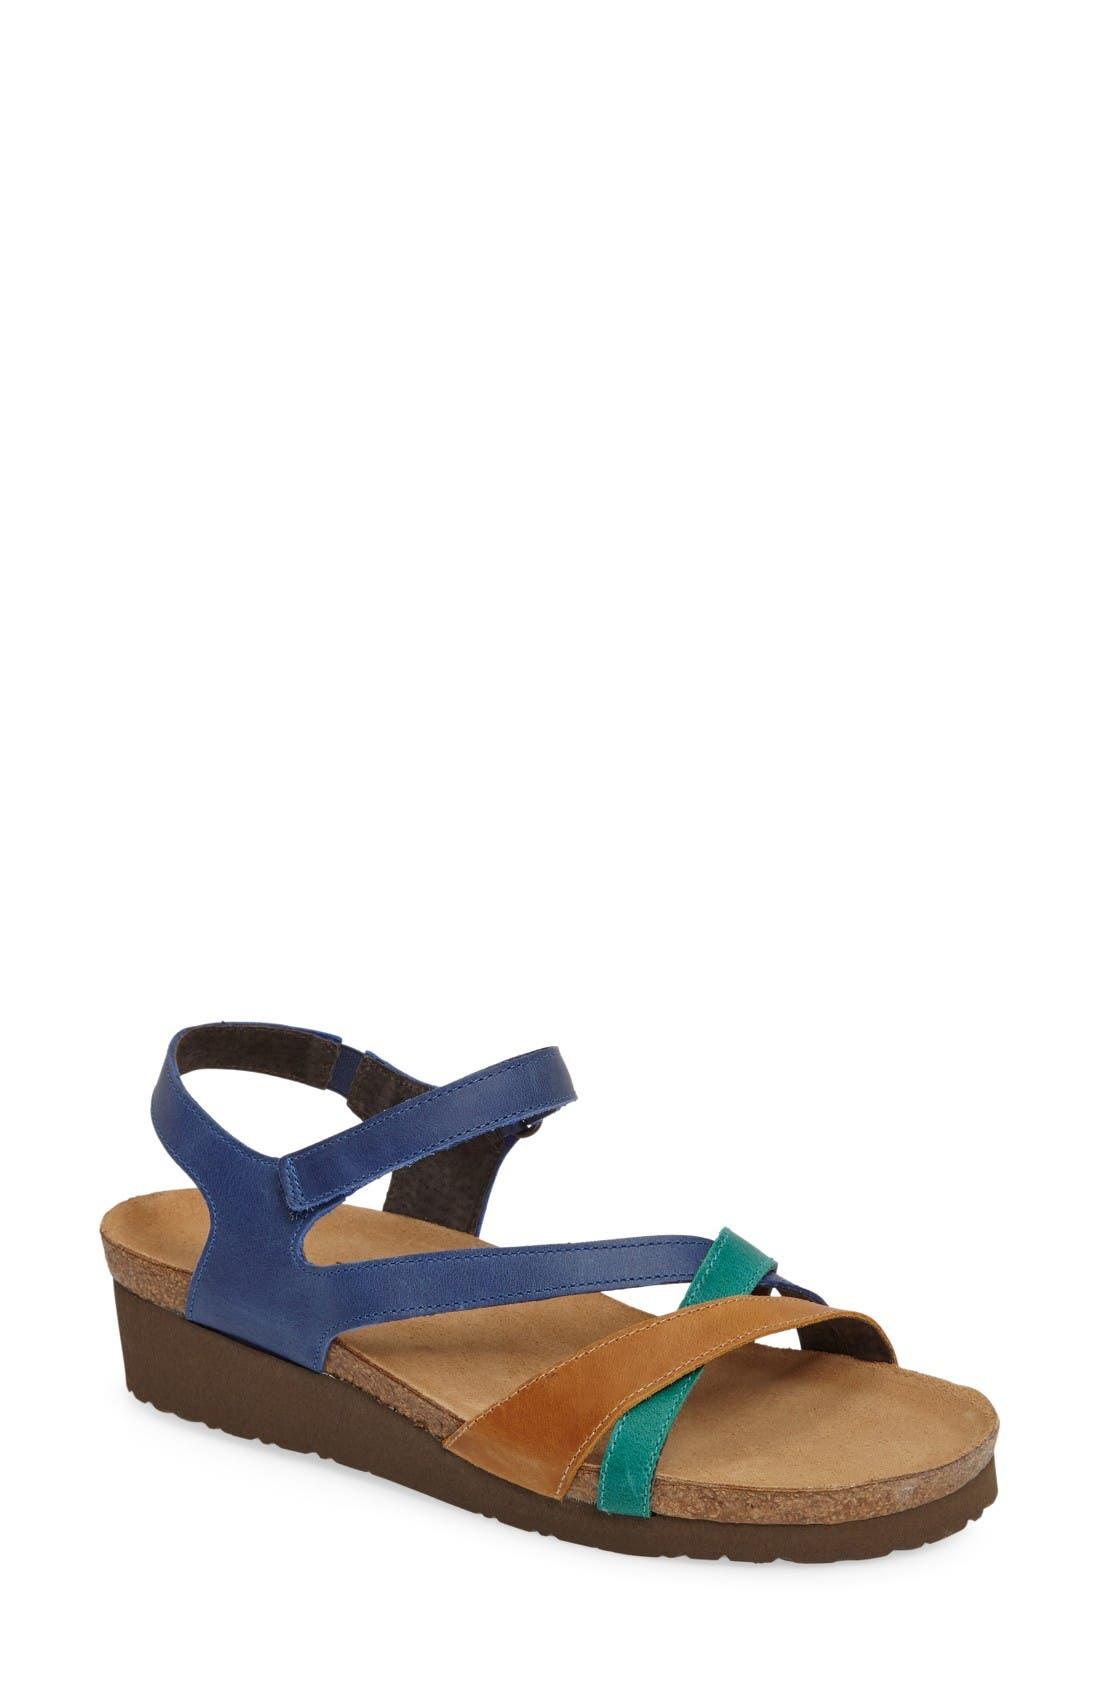 'Sophia' Sandal,                         Main,                         color, Blue/ Brown Nubuck Leather